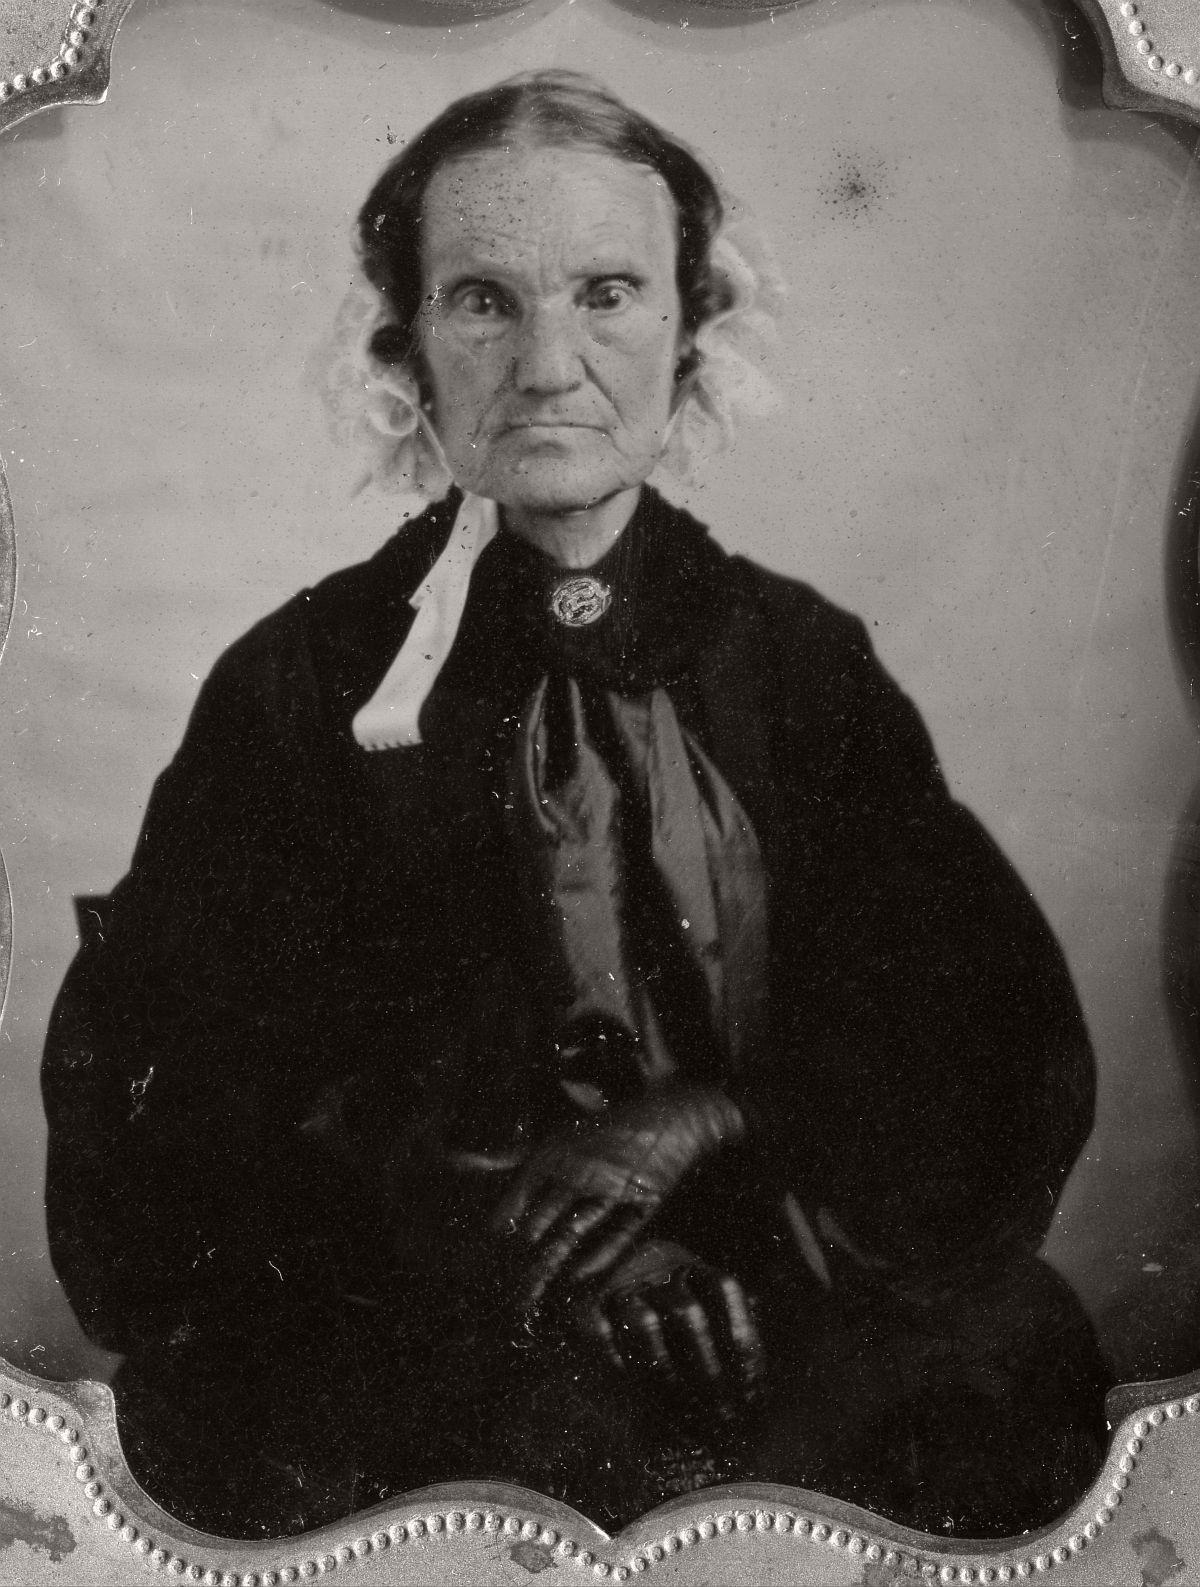 daguerreotype-portrait-ladies-born-in-the-late-18th-century-1700s-vintage-08